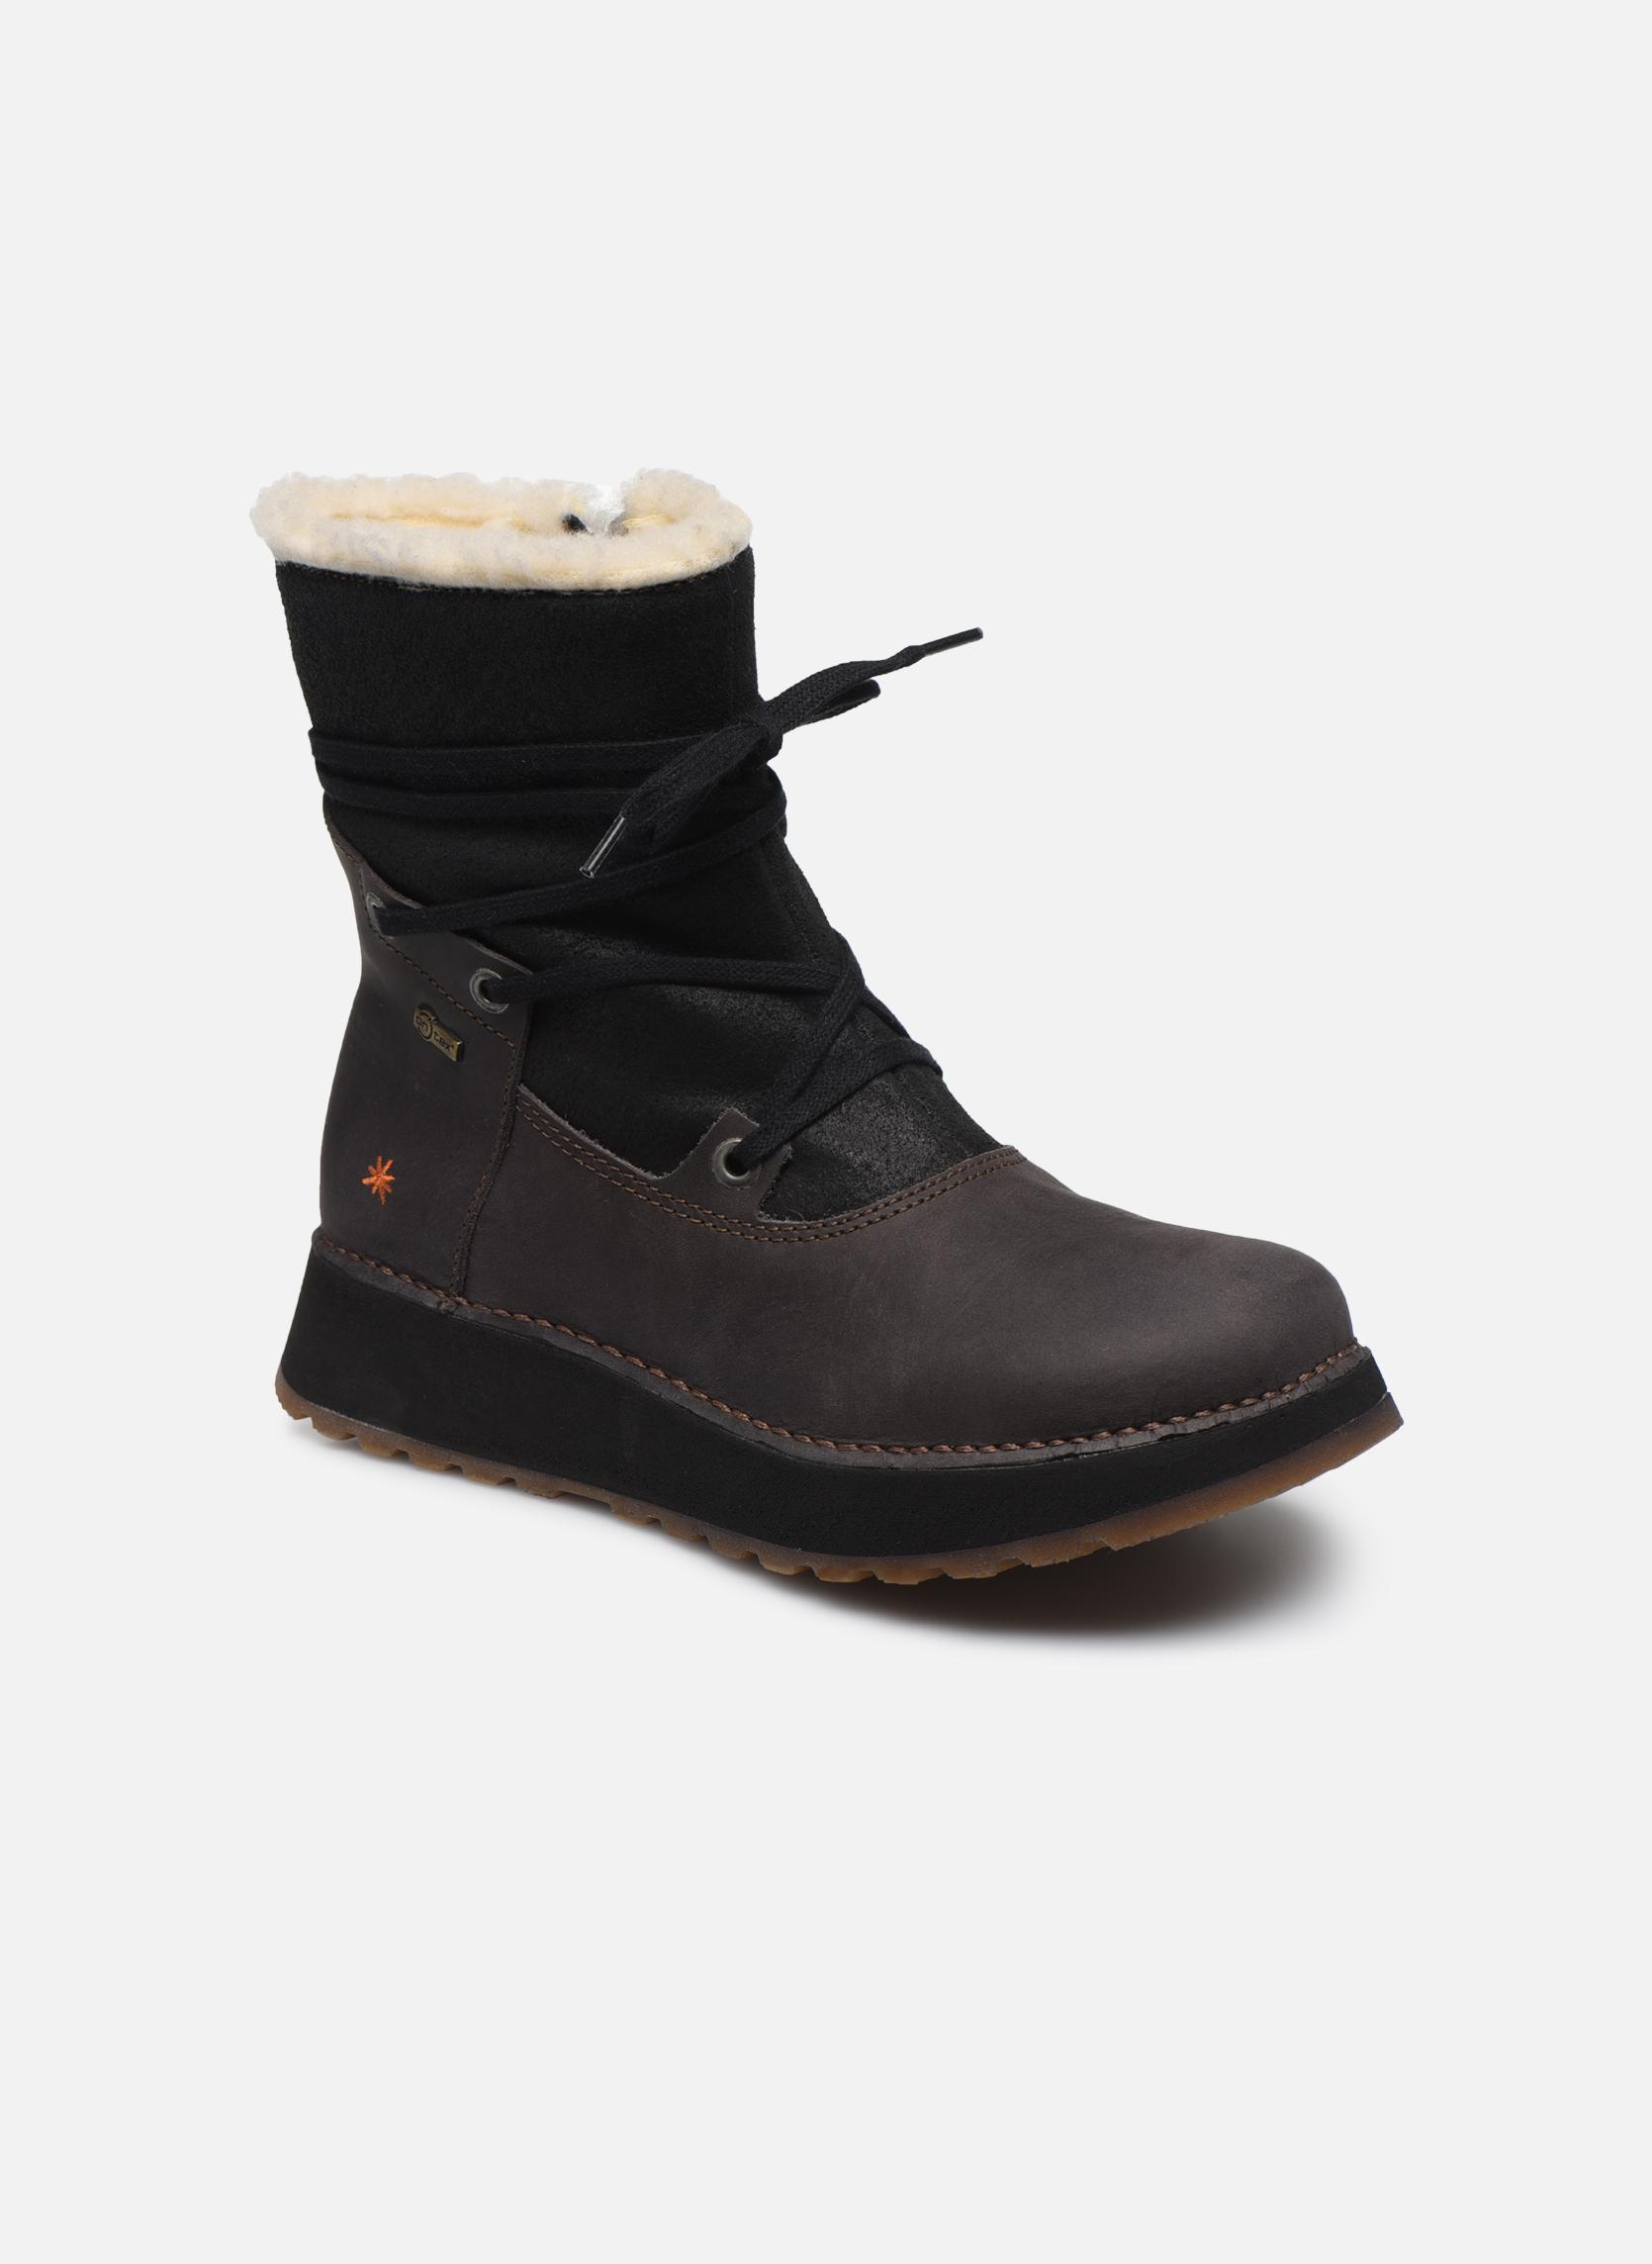 Bottines et boots Femme Heathrow 1024